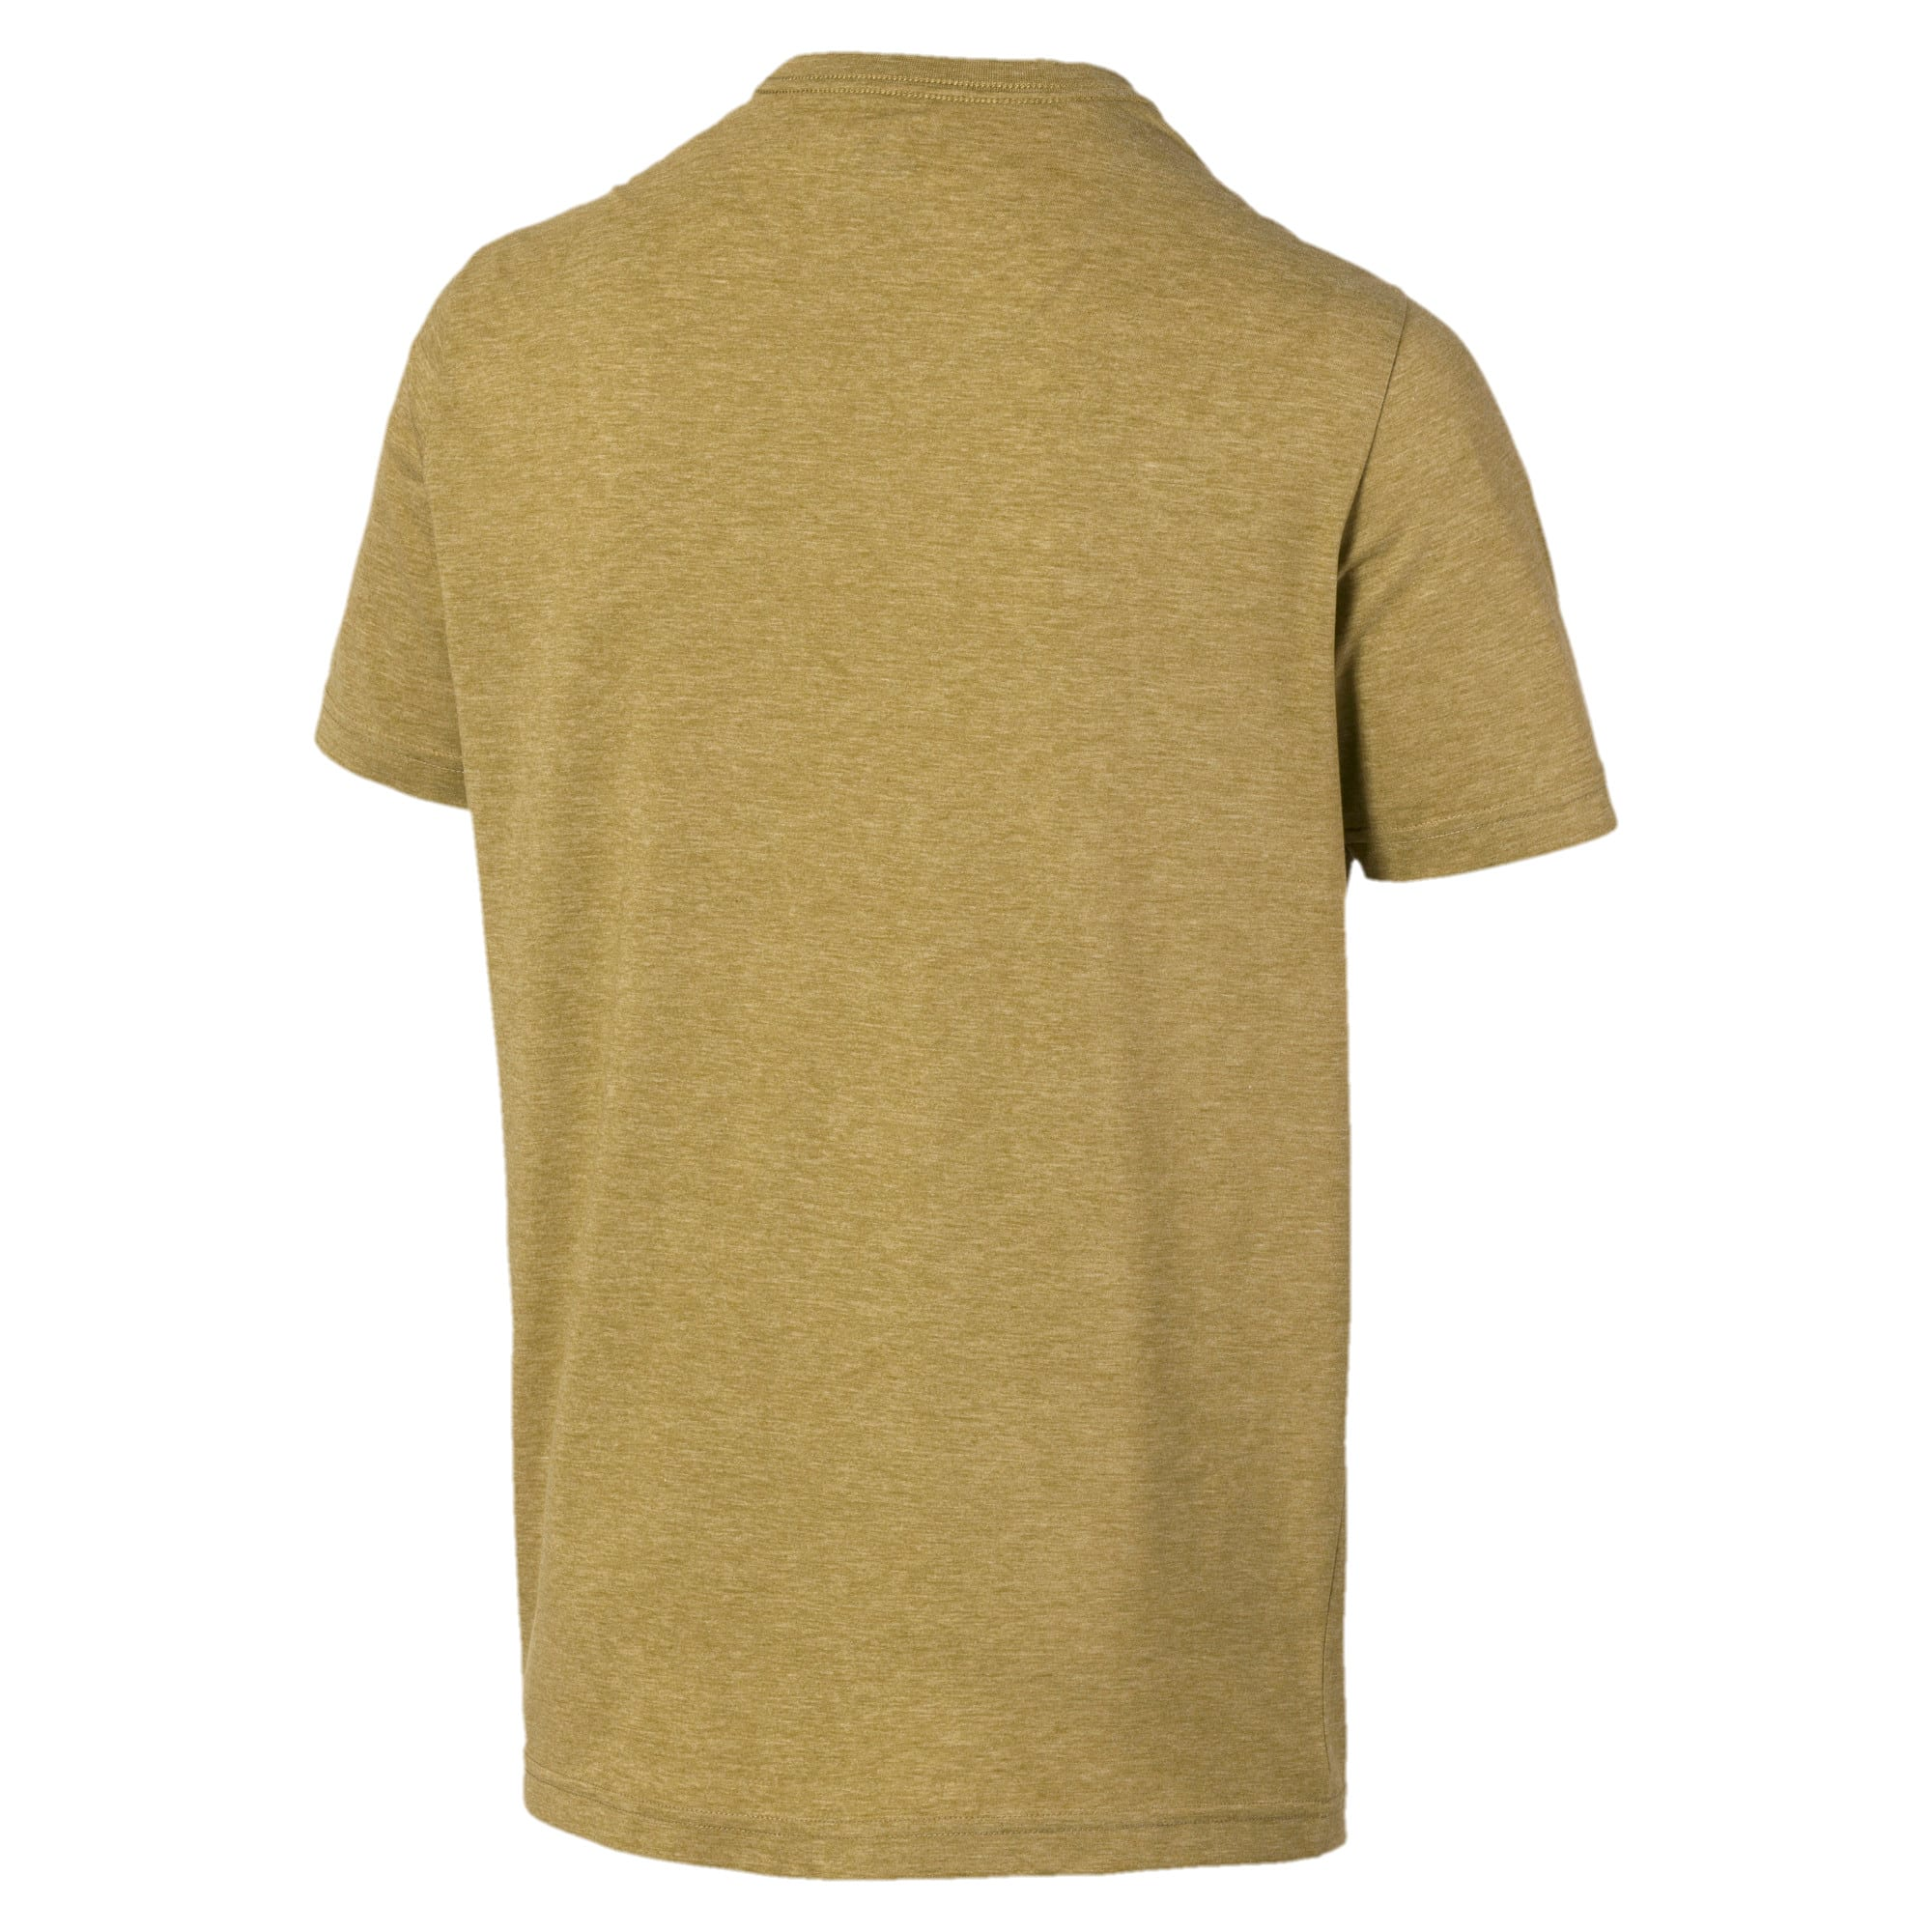 Thumbnail 5 of Meska koszulka Essentials+ Heathered, Moss Green Heather, medium